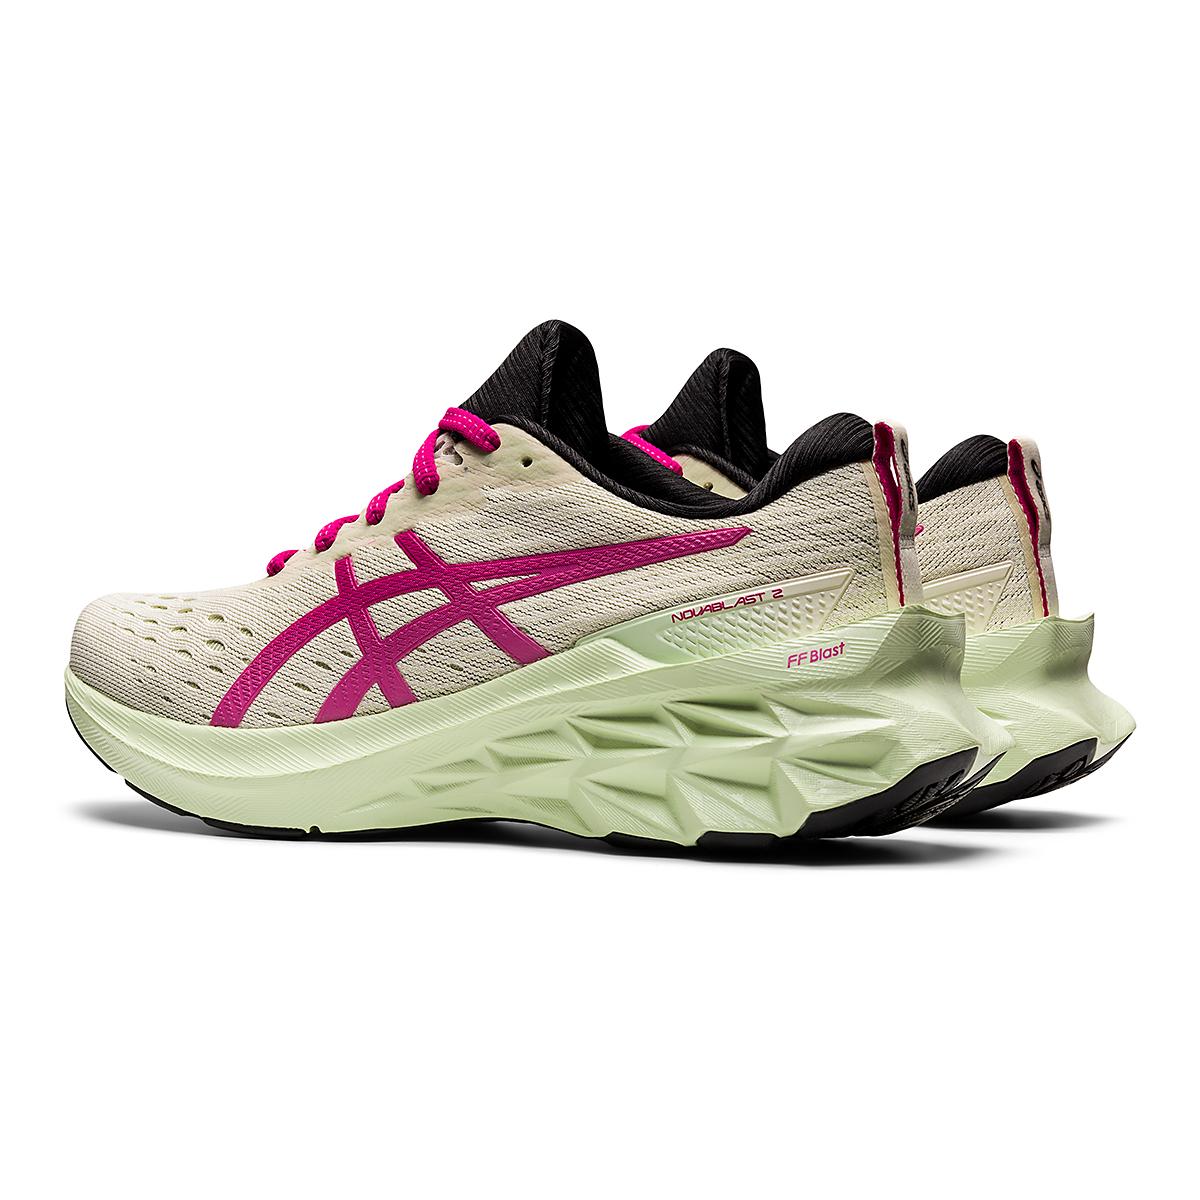 Women's Asics Novablast 2 Running Shoe - Color: Birch/Pink Rave - Size: 5 - Width: Regular, Birch/Pink Rave, large, image 4